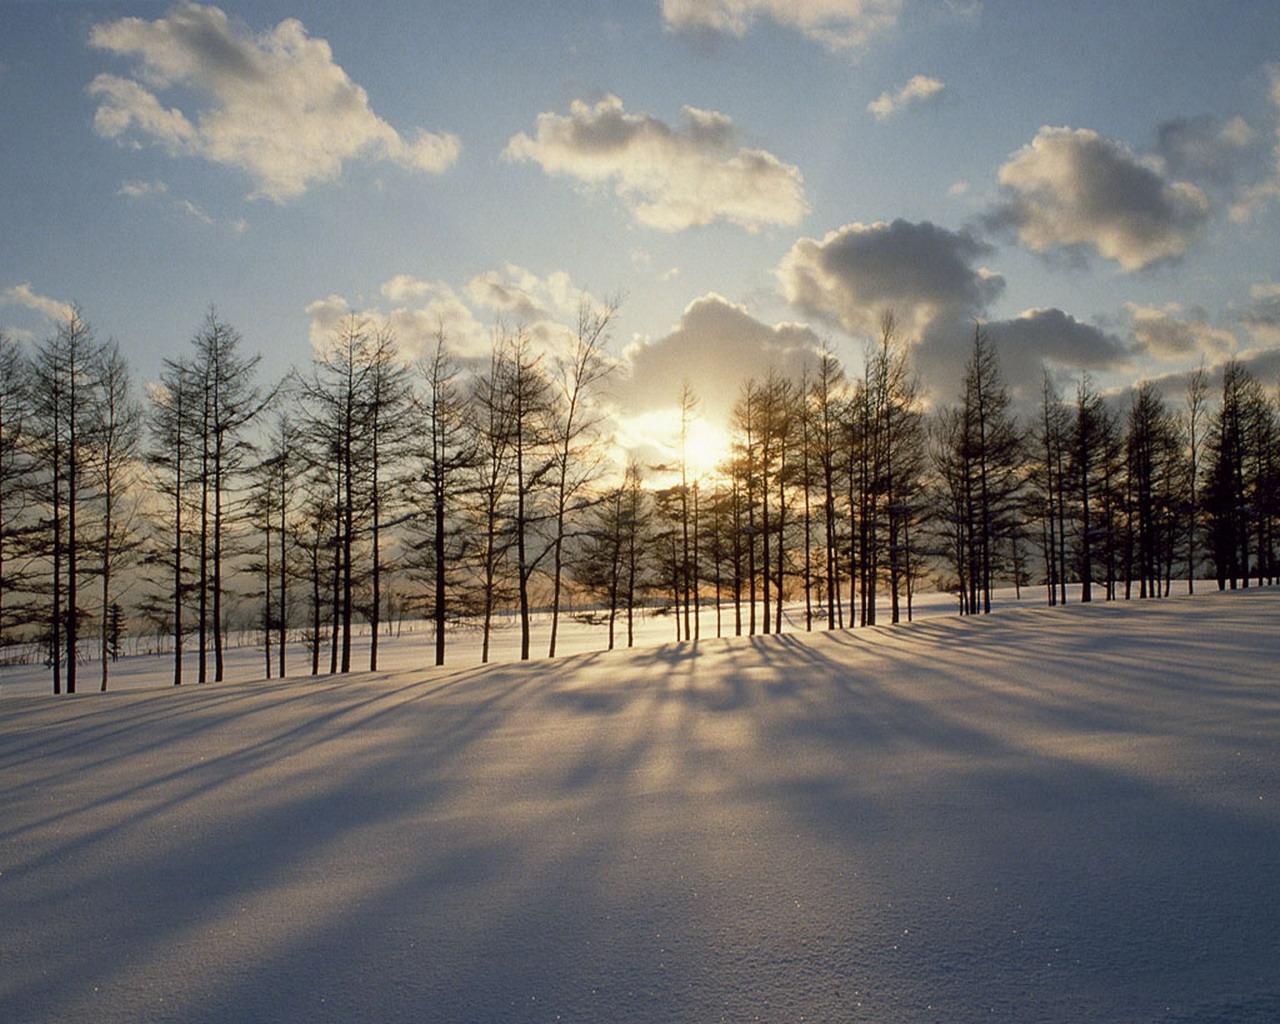 http://4.bp.blogspot.com/_ZMpCyvKsRzk/TSZfjWWpI-I/AAAAAAAAAF8/NzghcxBBurY/s1600/snowy-sunset-wallpaper.jpg